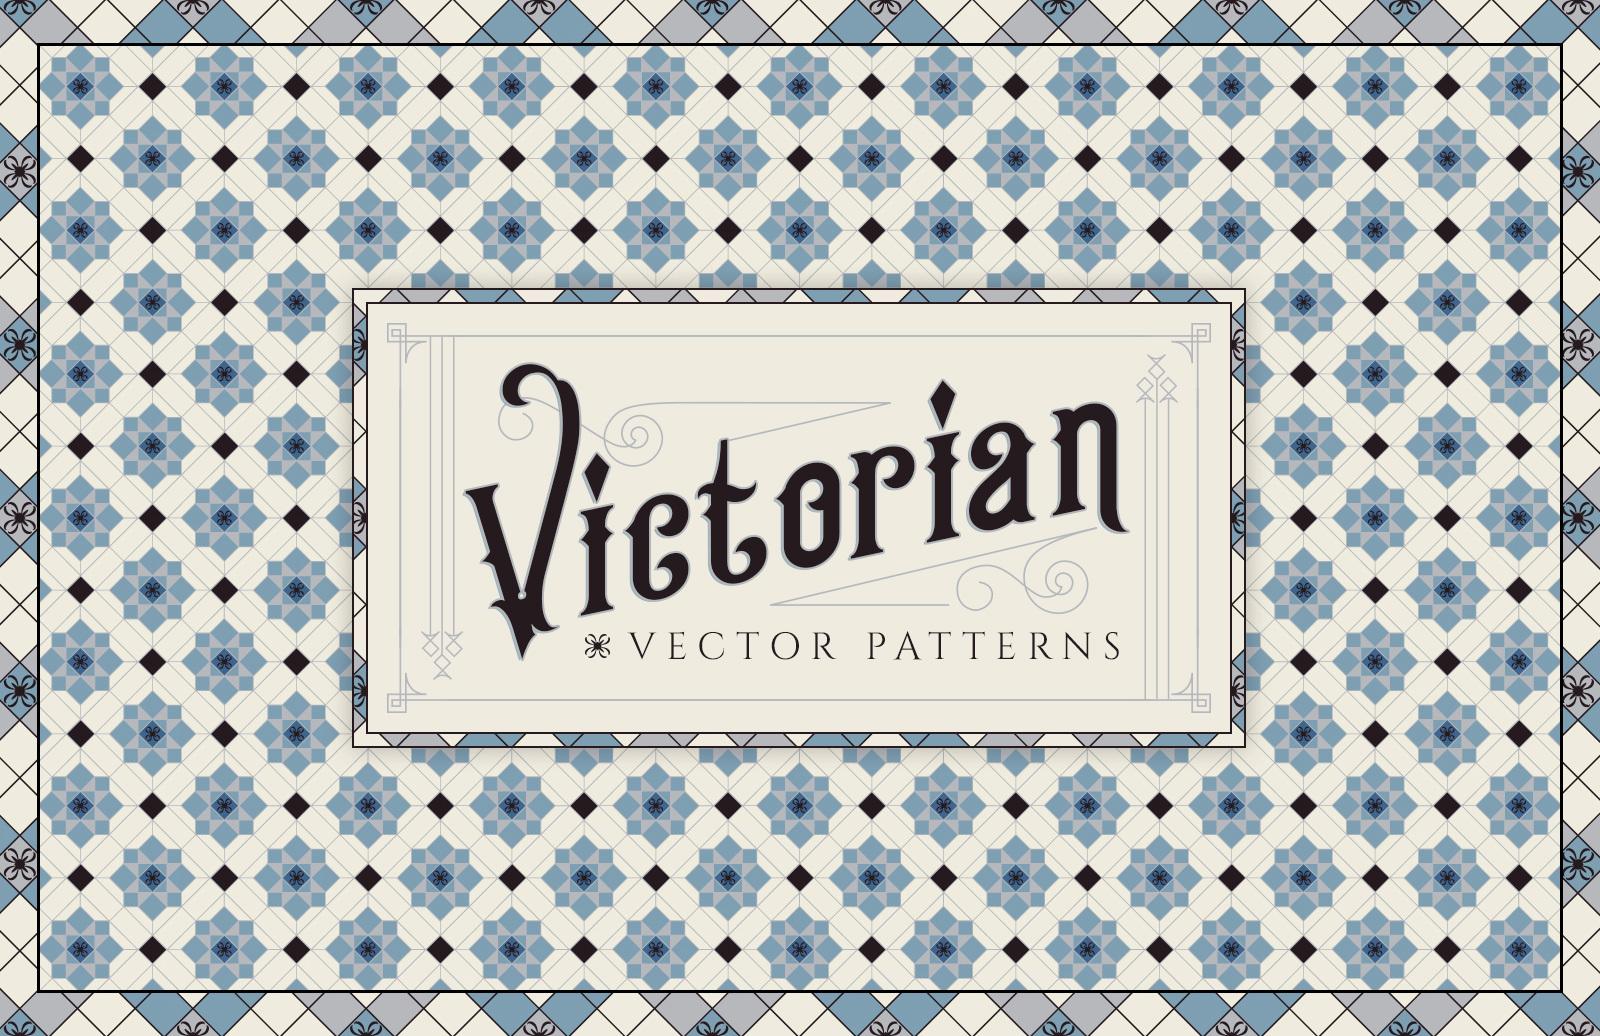 Victorian Vector Patterns 1